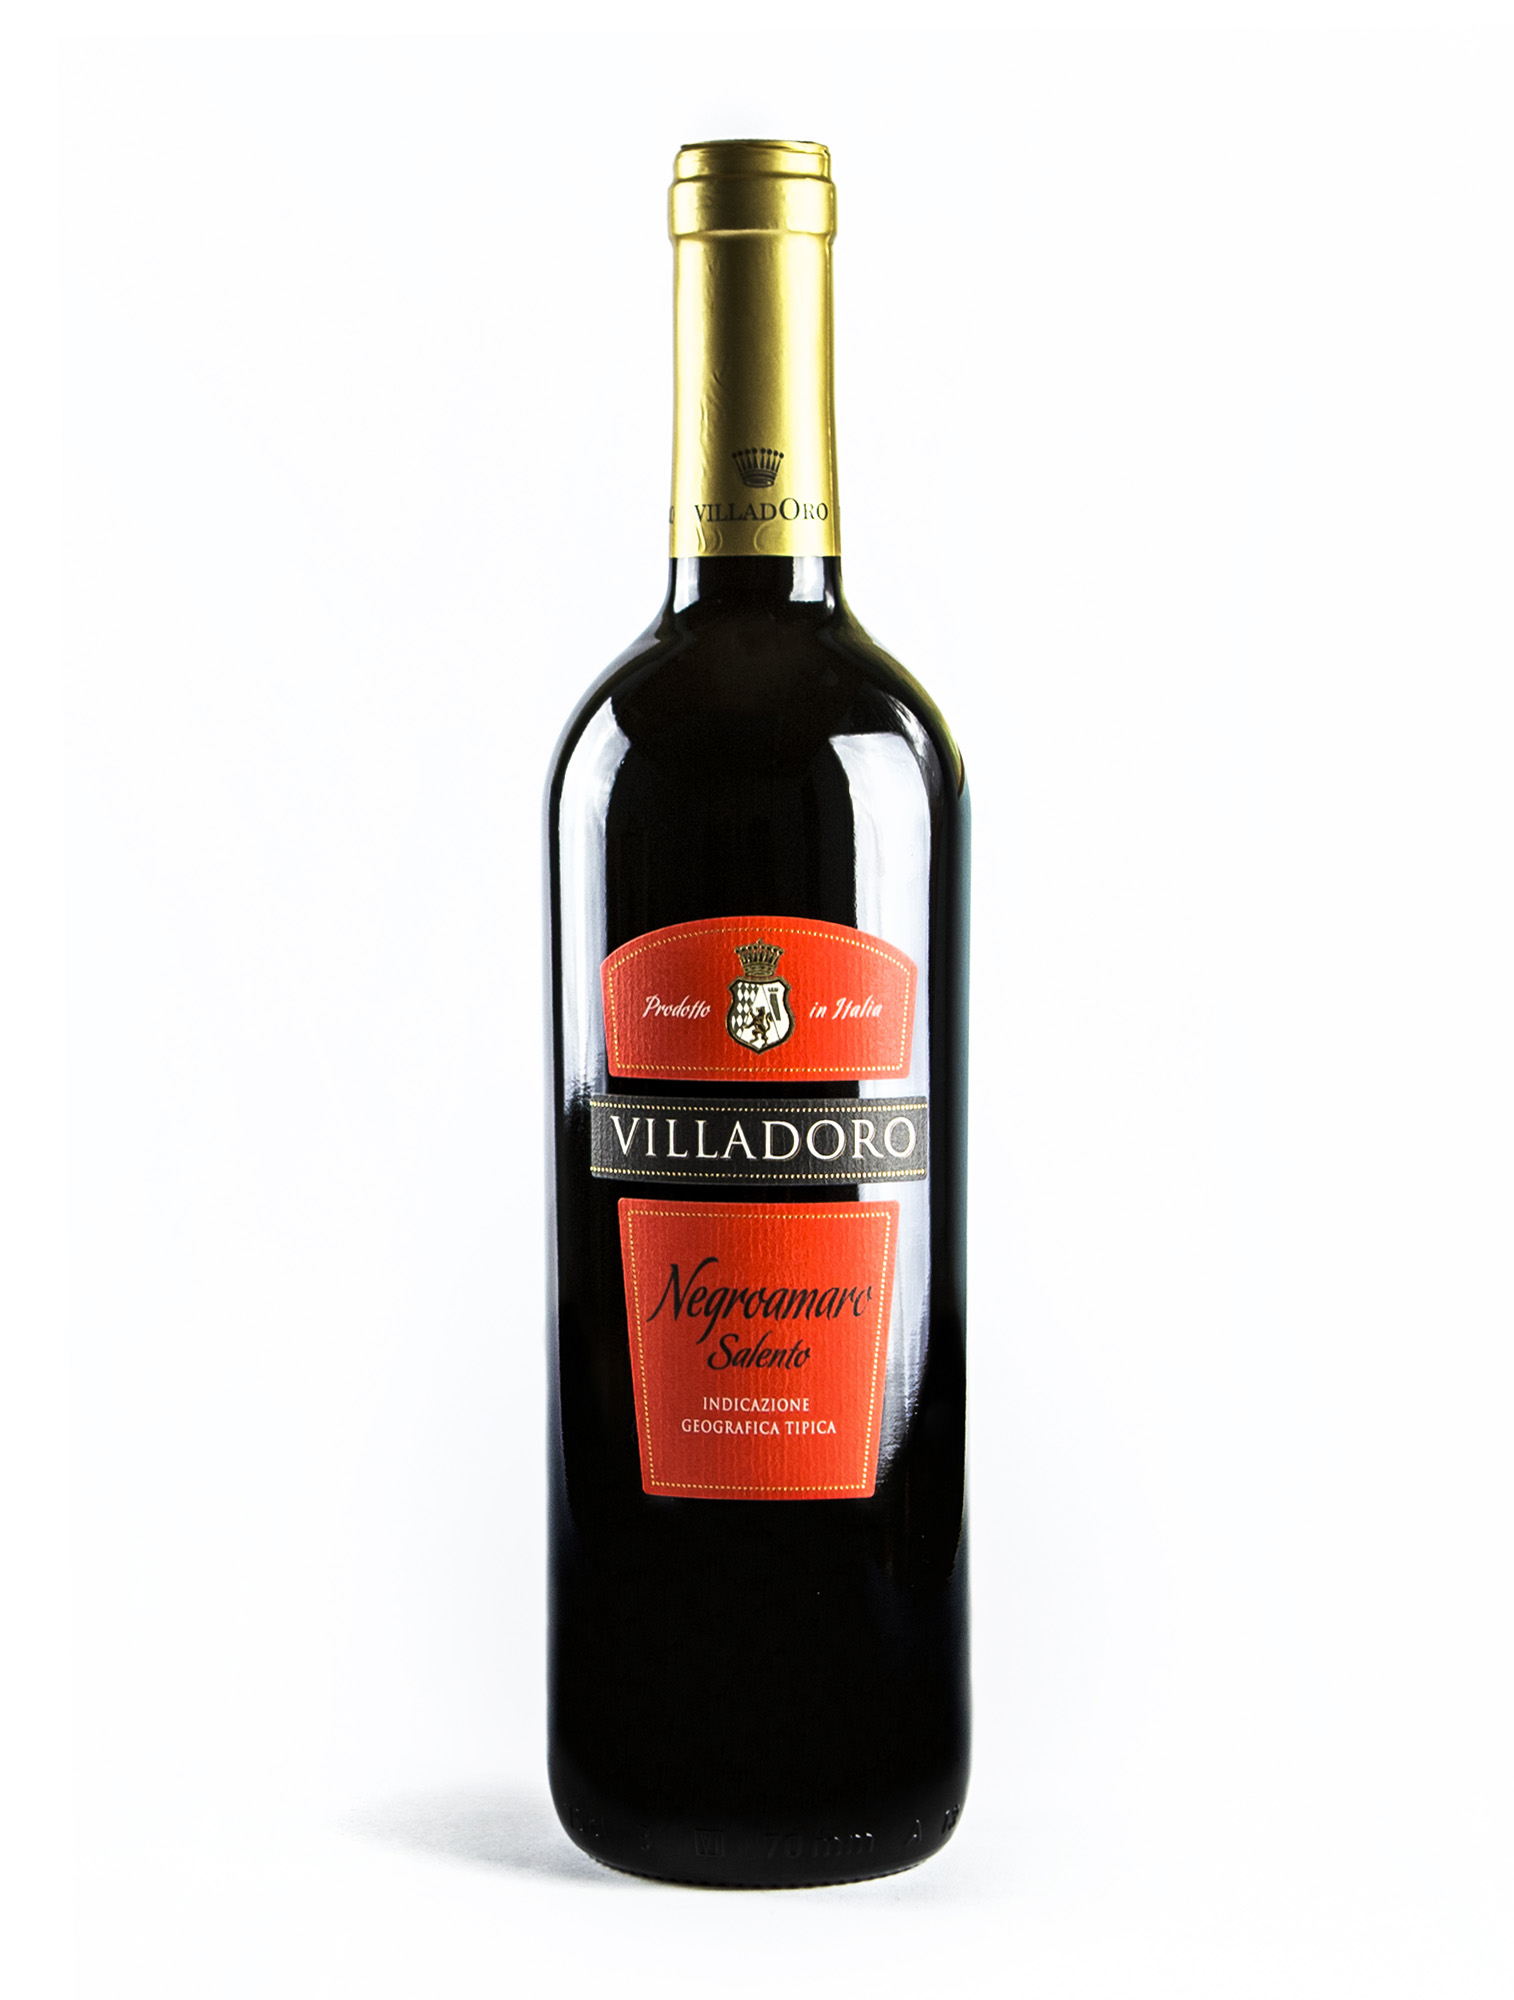 VILLADORO Negroamaro vino rosso italiano